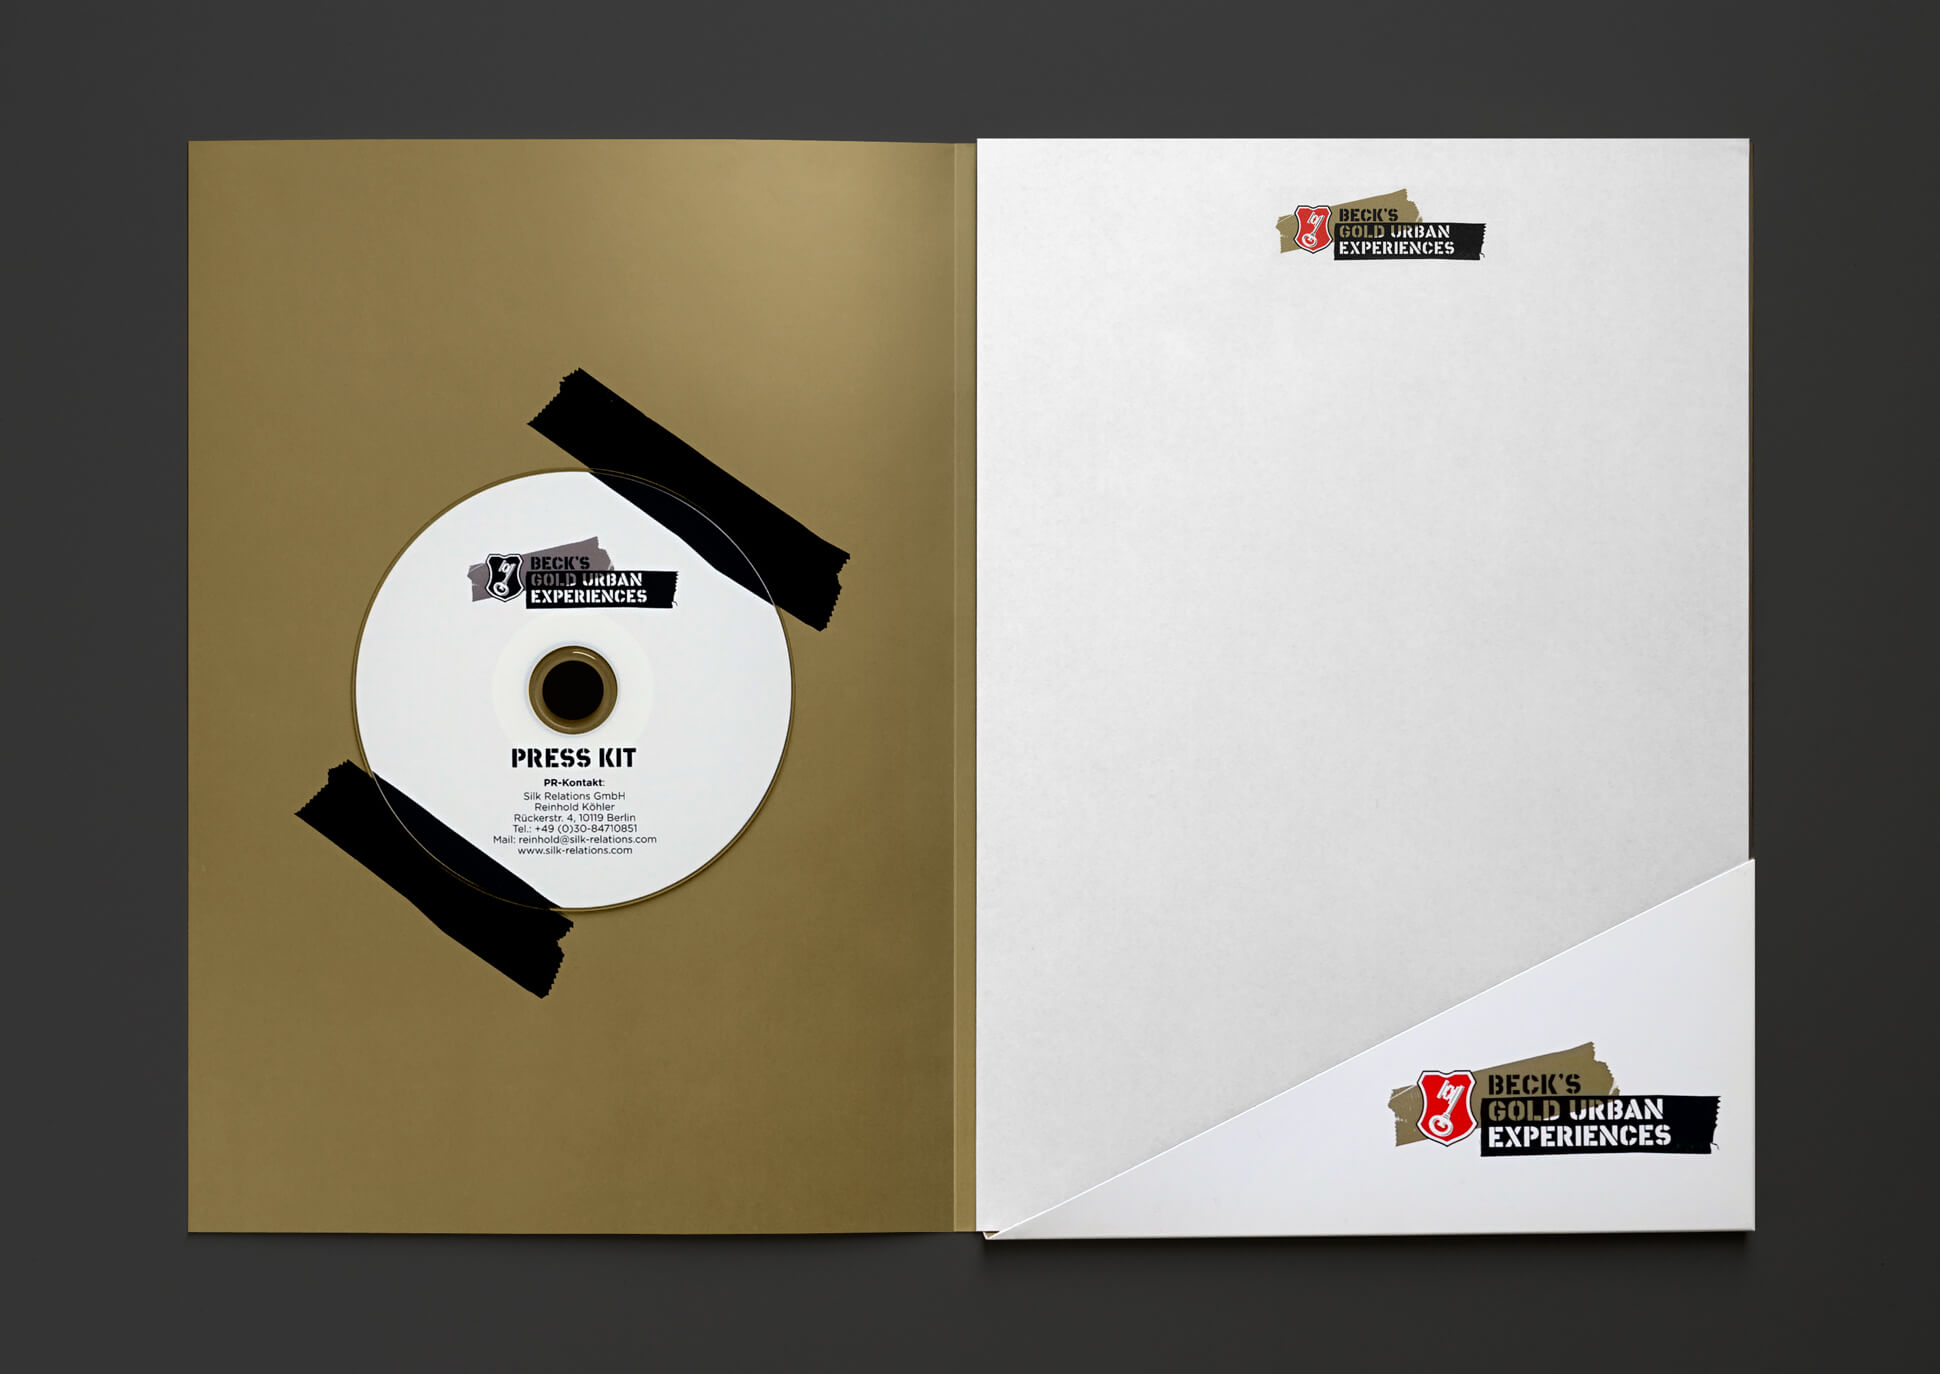 Becks-Gold-Experiences-Pressemappe-002